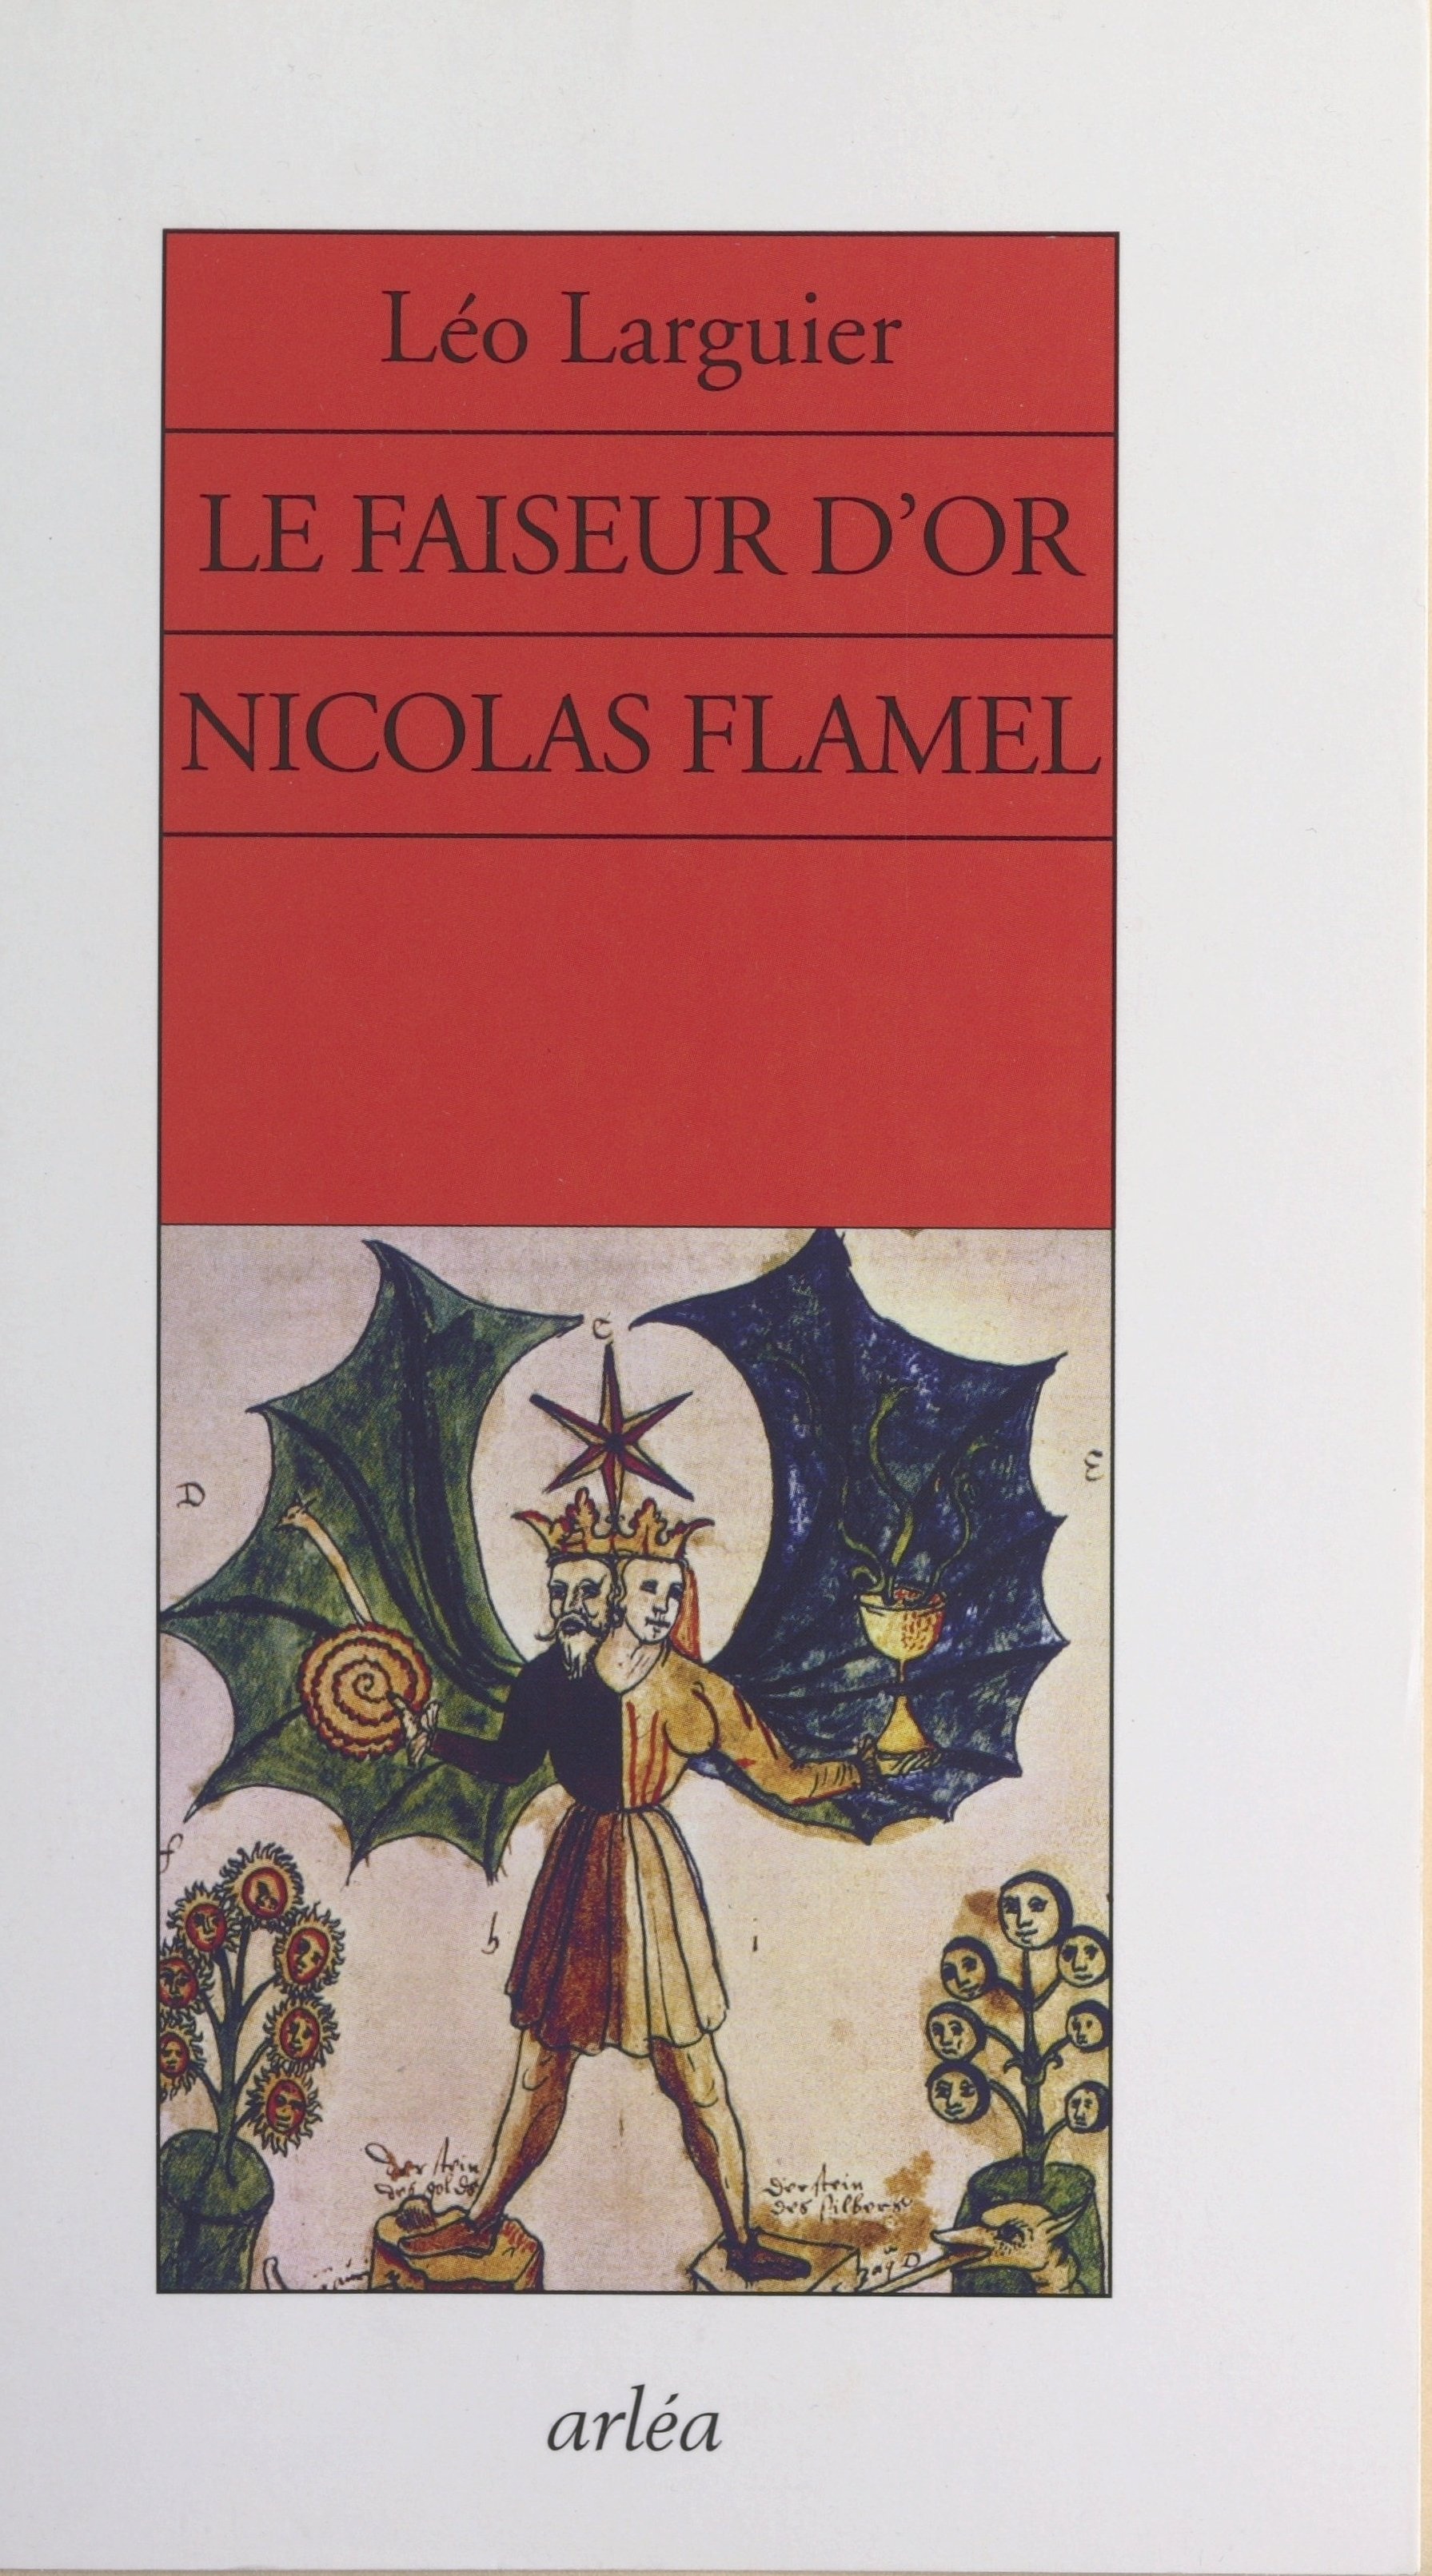 Le faiseur d'or, Nicolas Fl...